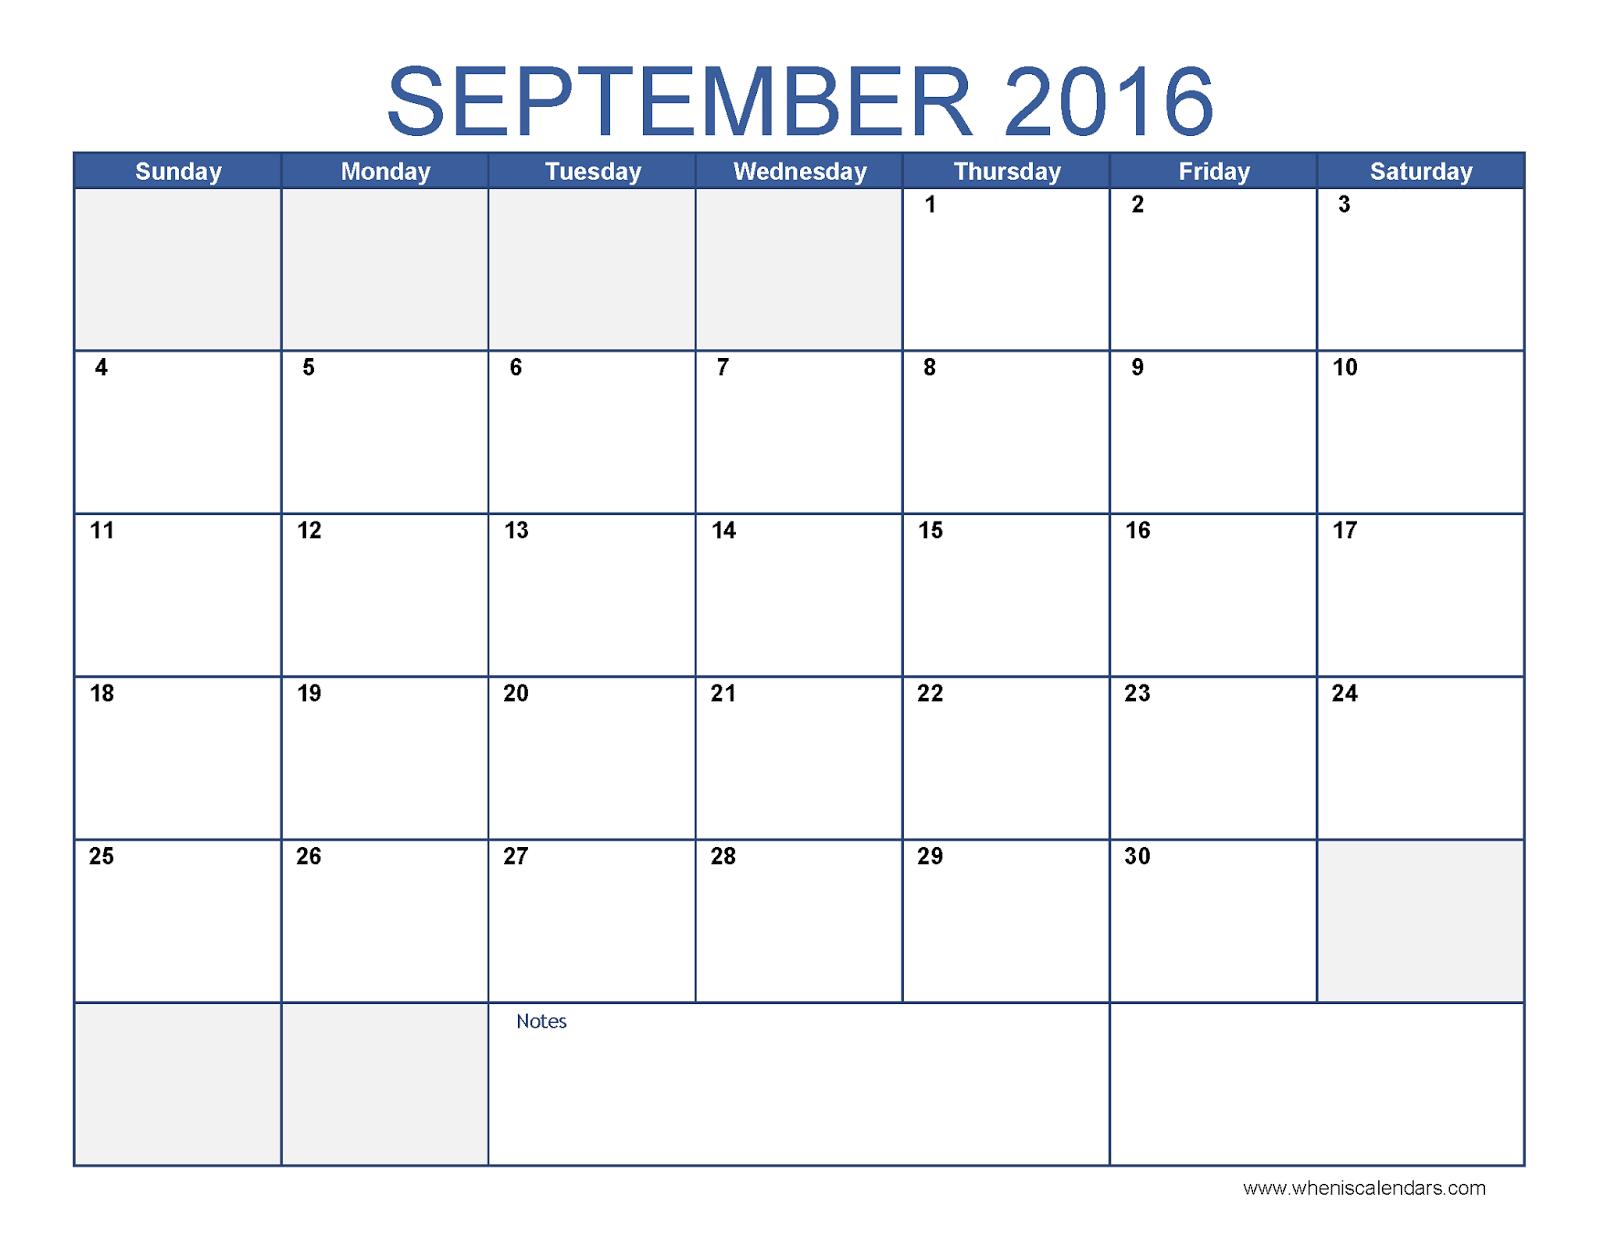 September Calendar 2016 With Holidays : Free calendar printable template holidays blank